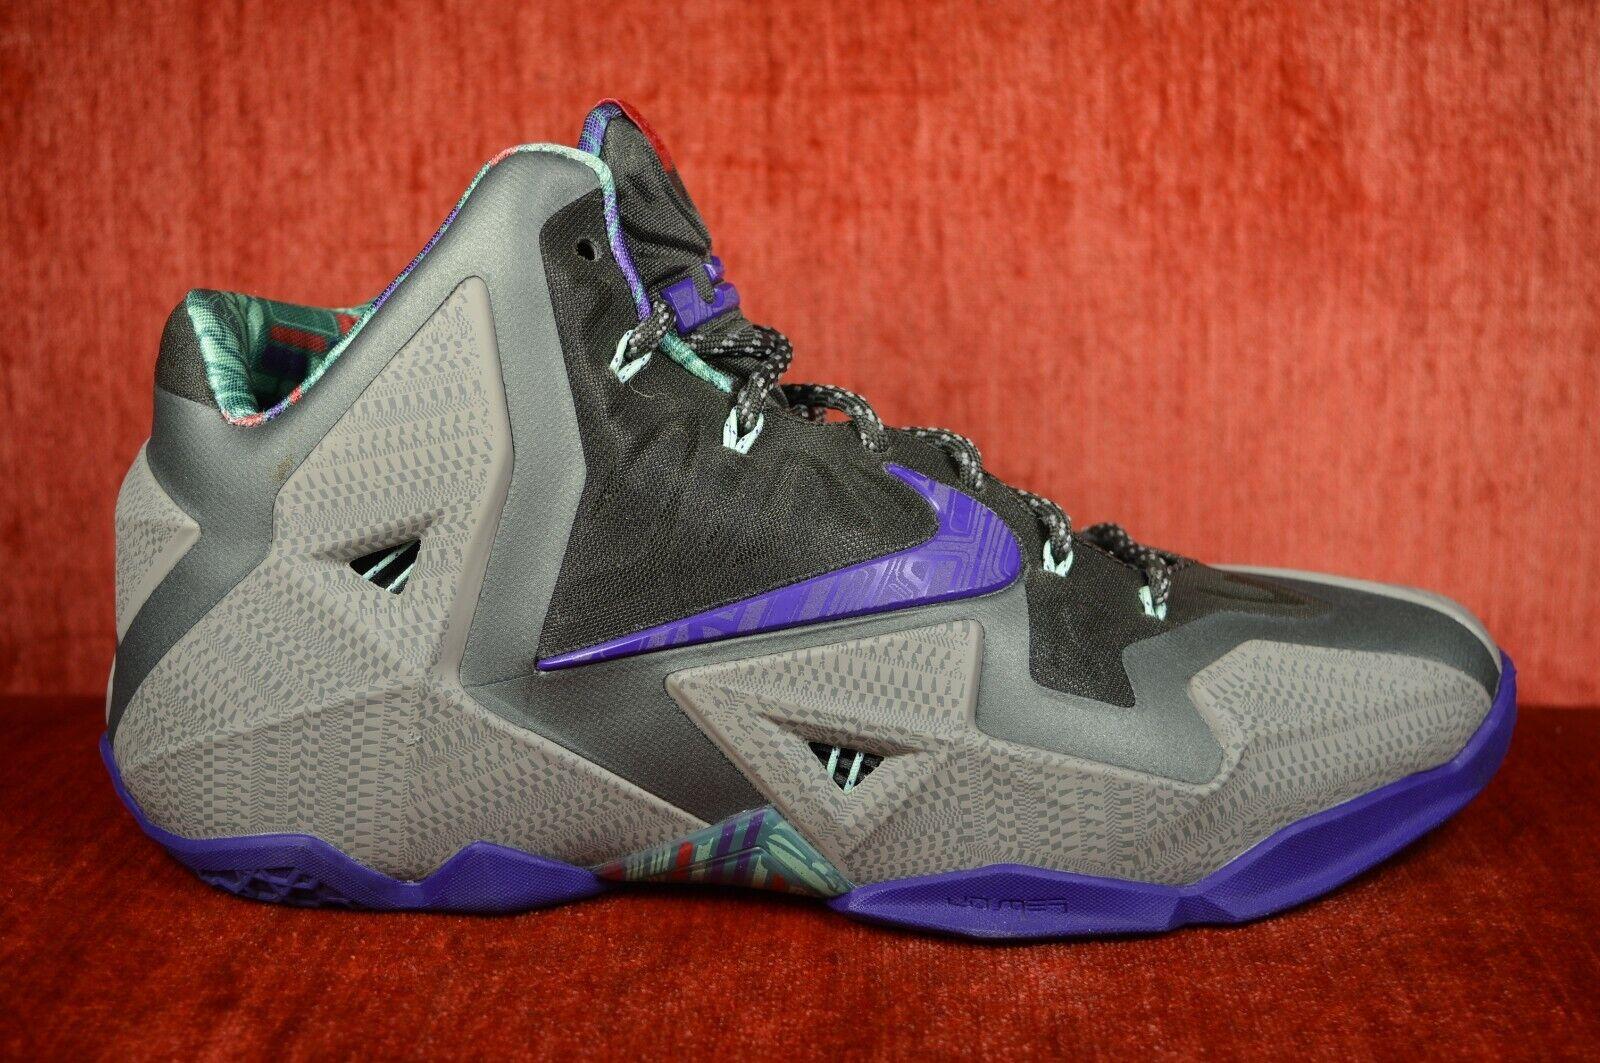 CLEAN  Nike Lebron XI 11 Terracotta Guerriero Grigio viola 6175 -005 Dimensione 10  outlet online